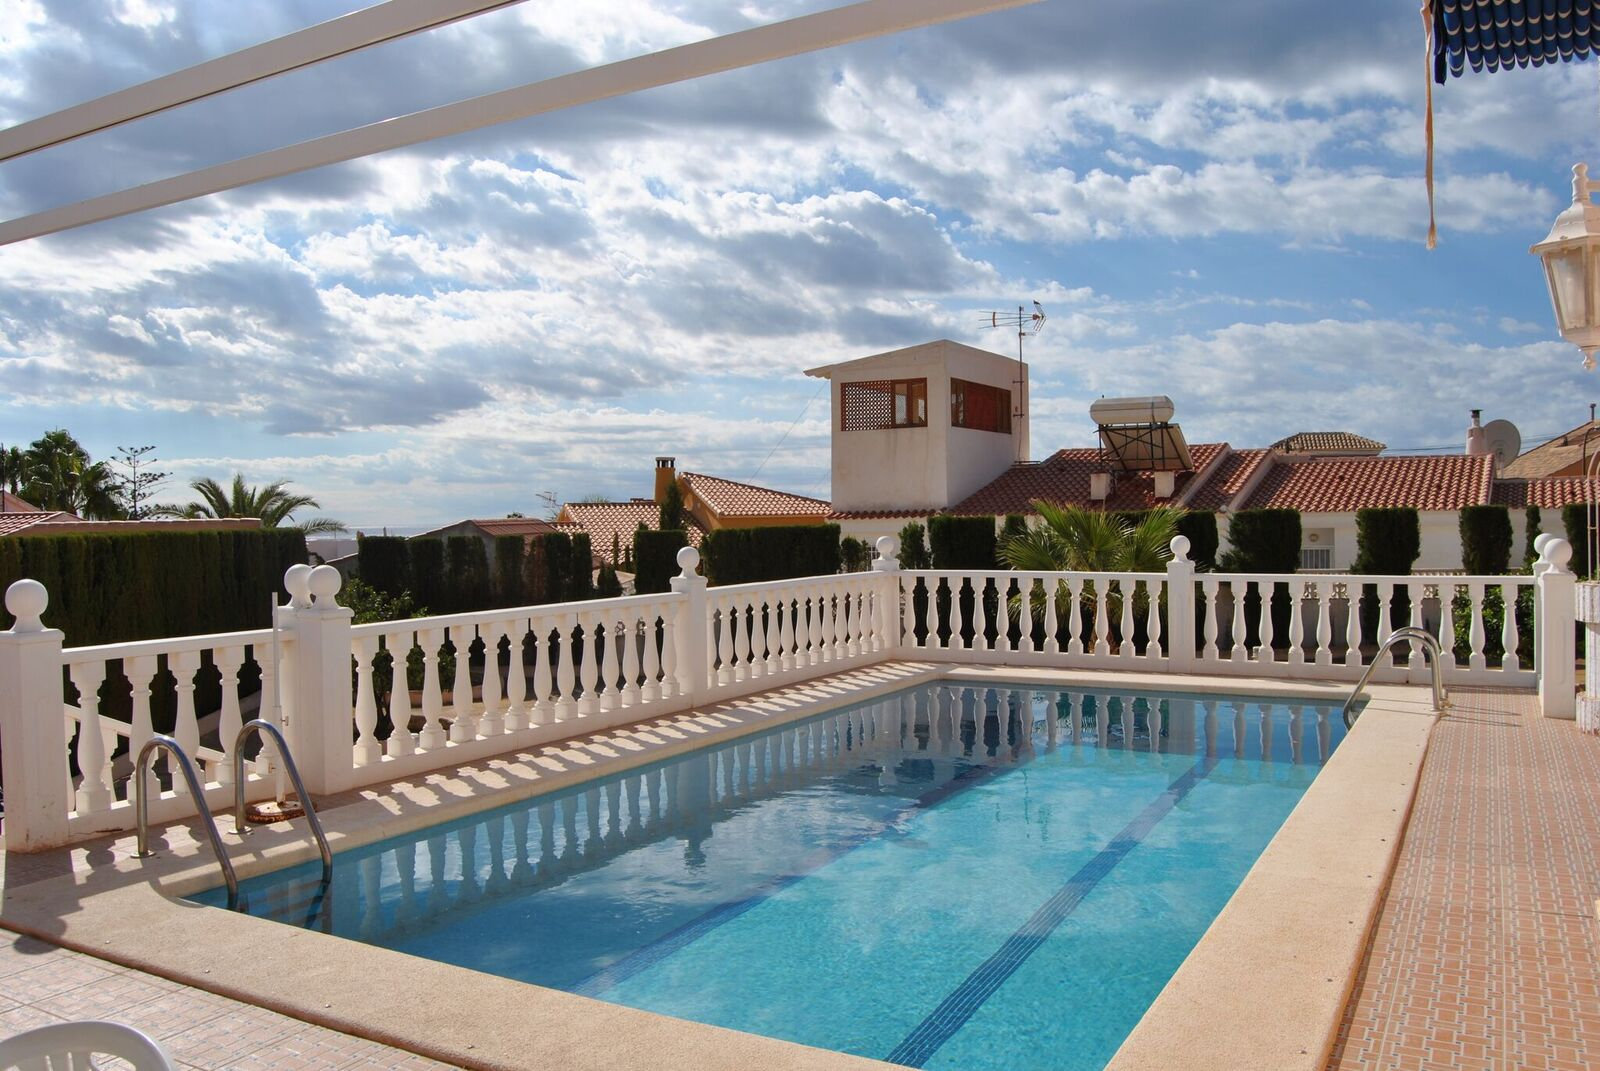 Villa impresionante con piscina privada en bolnuevo casana for Piscina privada